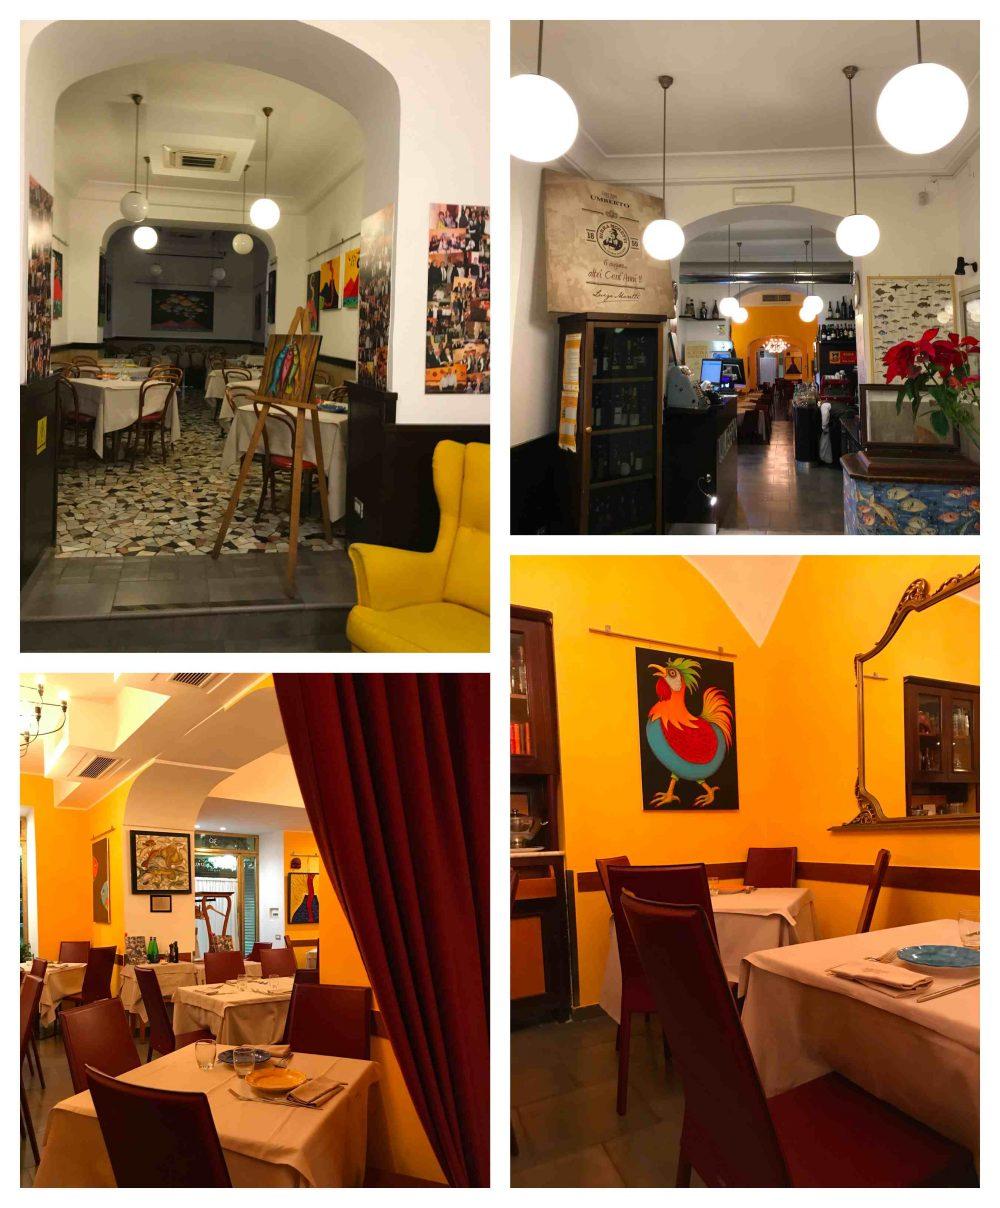 Ristorante Pizzeria Umberto - sala